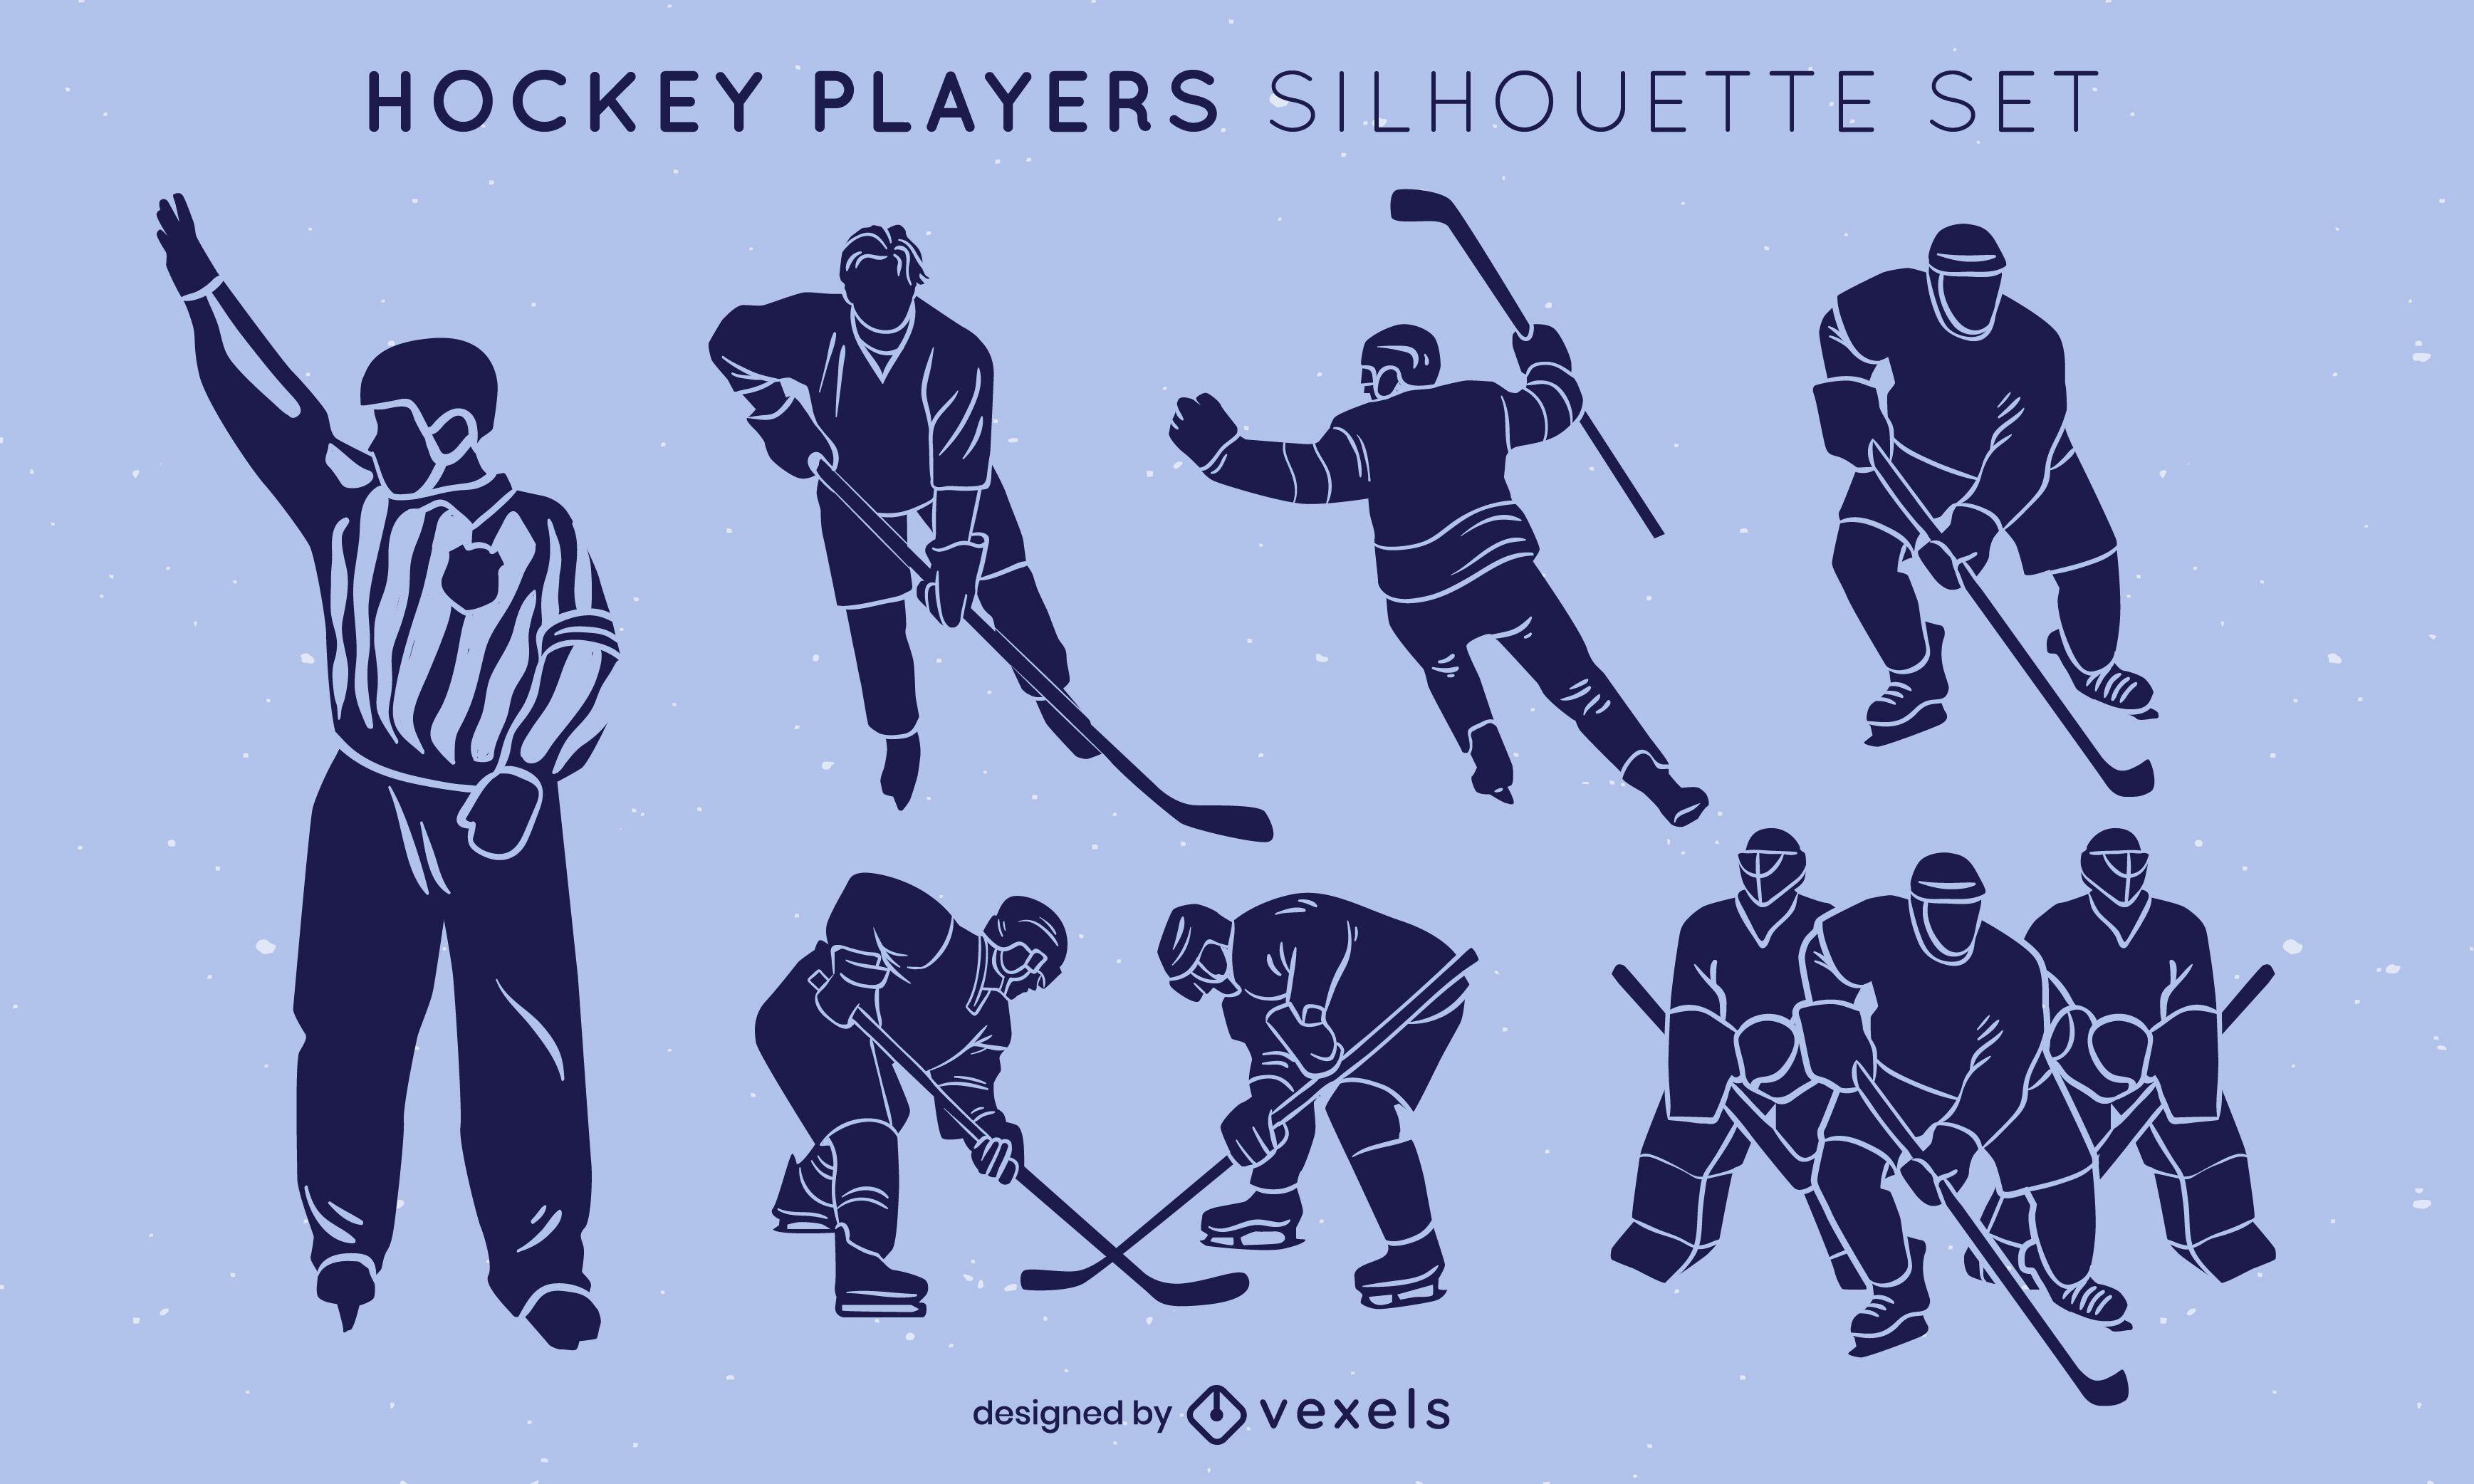 Ice hockey players poses sport silhouette set